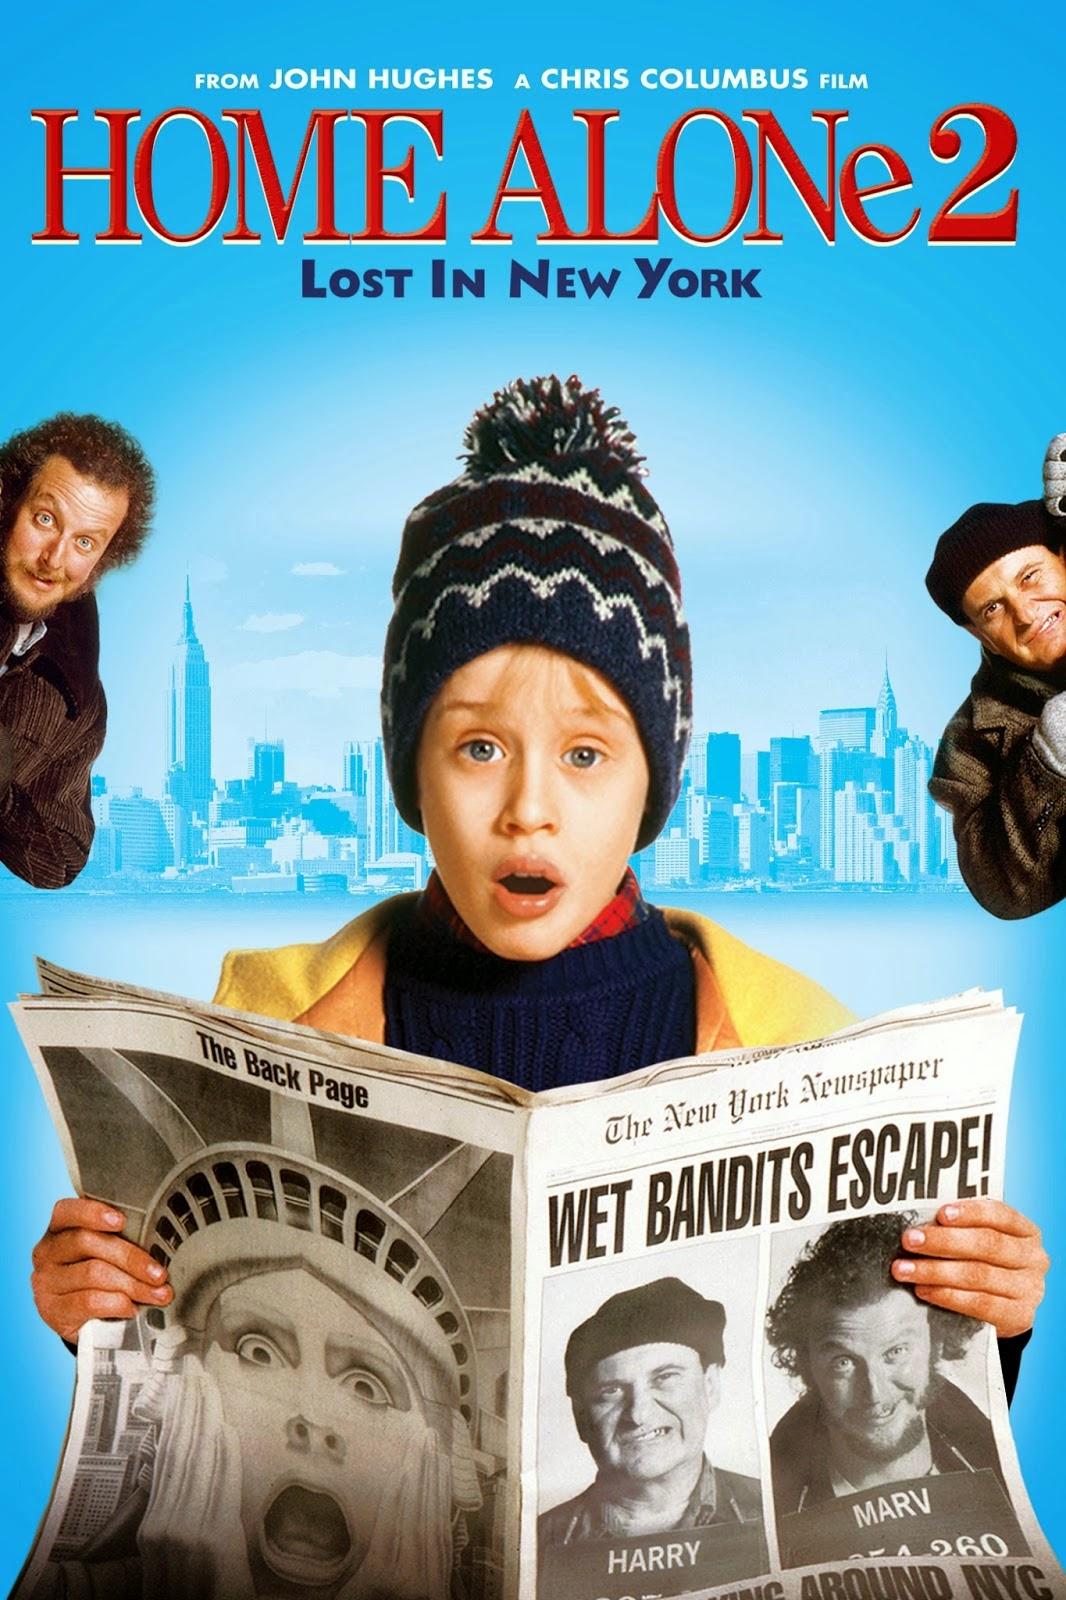 Home Alone 2 : Lost in New York (1992) โดดเดี่ยวผู้น่ารัก 2 Full HD มาสเตอร์ พากย์ไทย